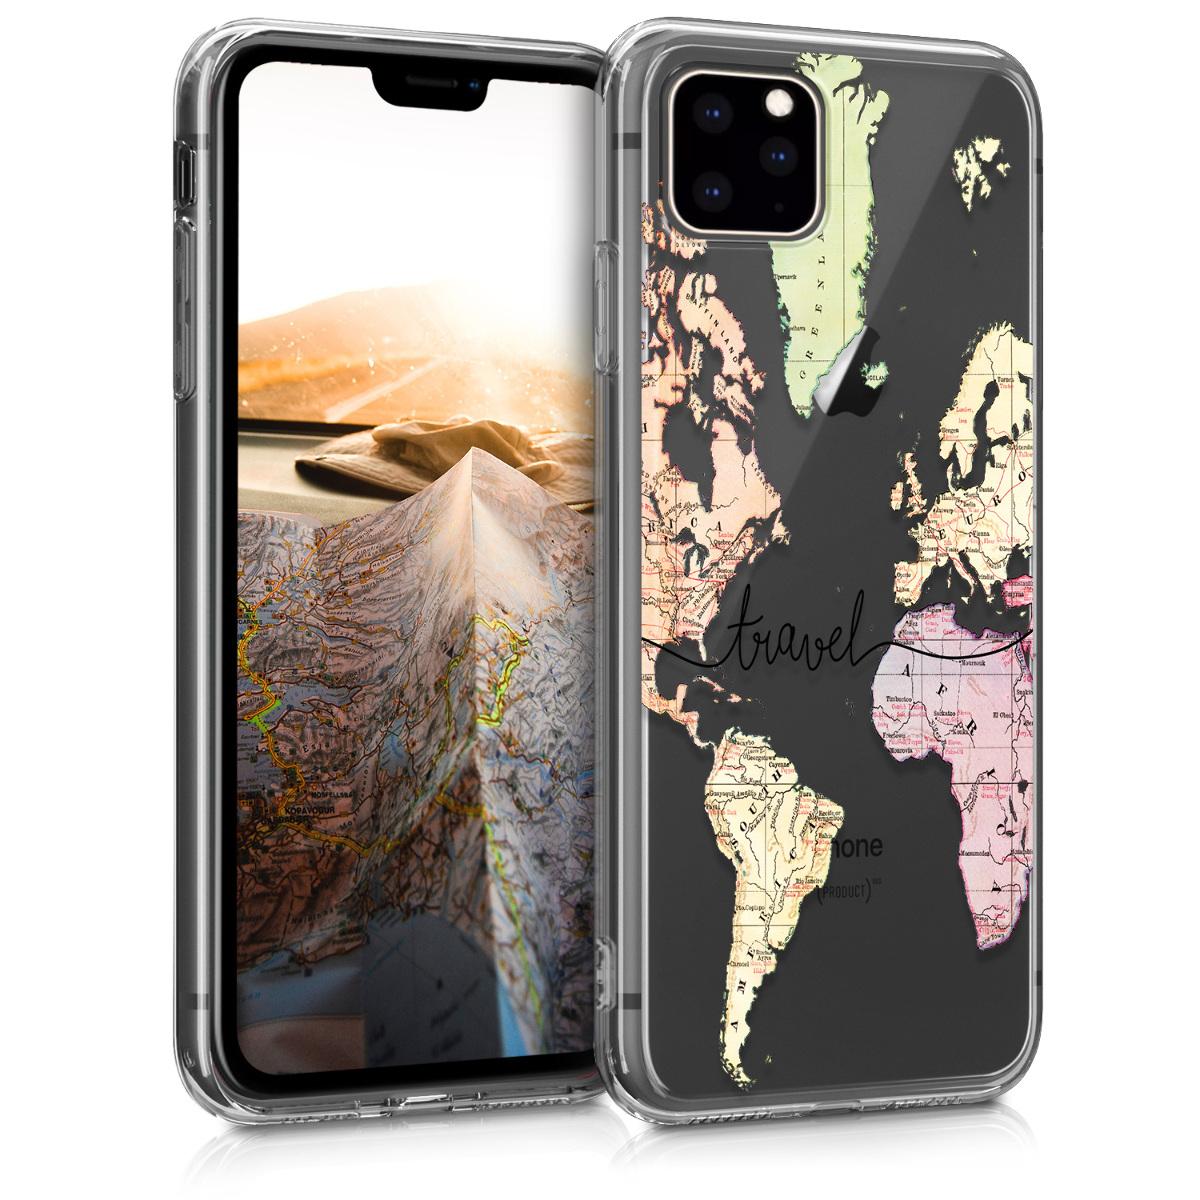 KW Θήκη Σιλικόνης iPhone 11 Pro - Black / Multicolor / Transparent (49793.02)